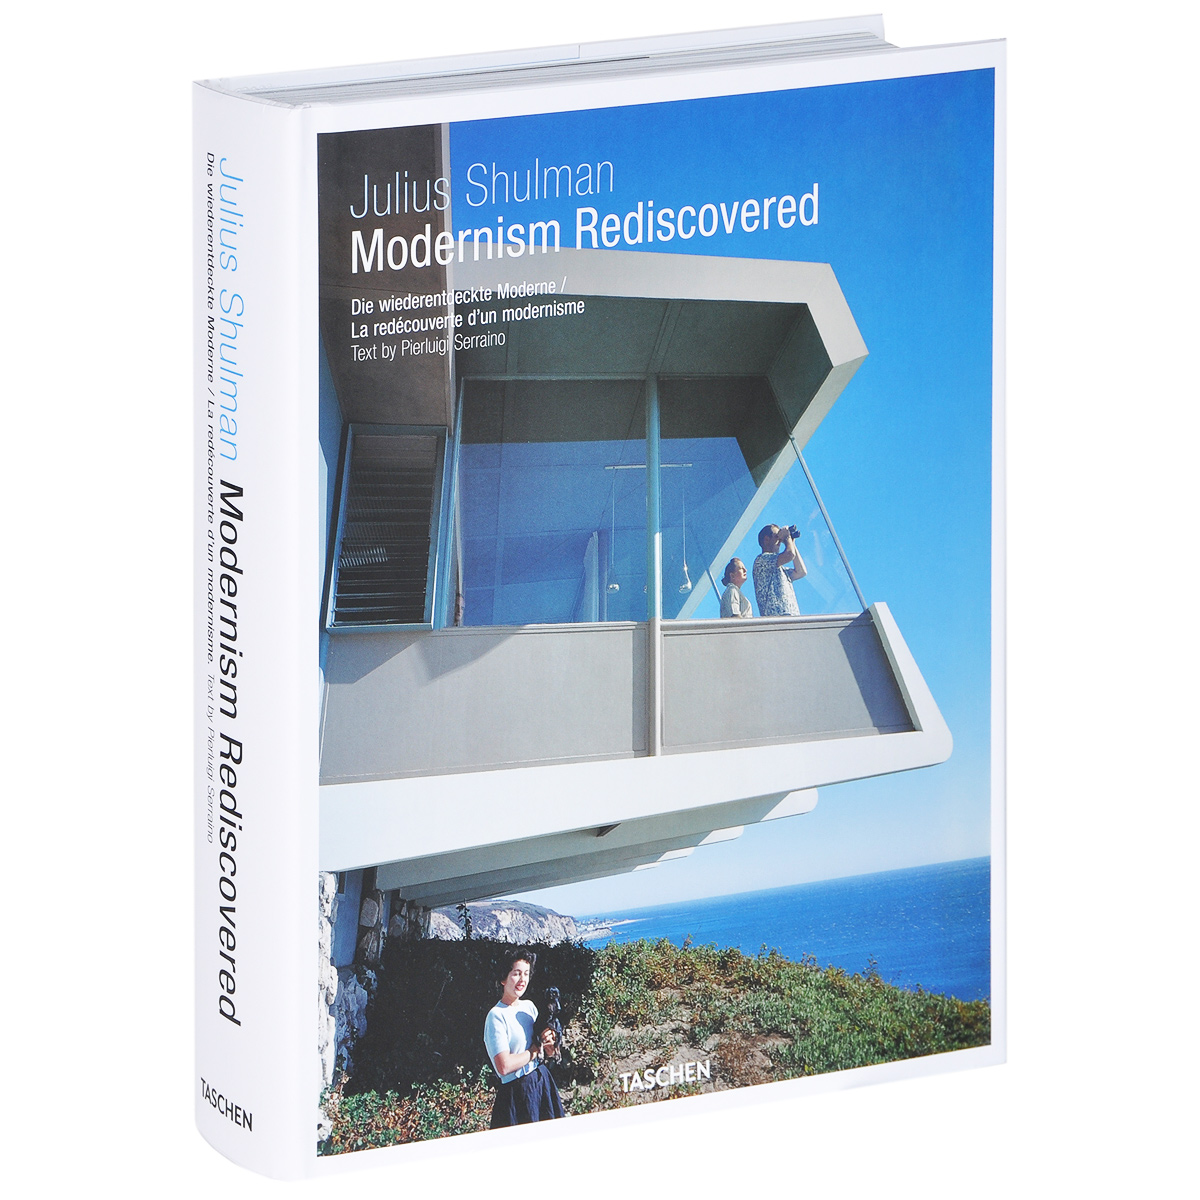 Julius Shulman: Modernism Rediscovered modernism